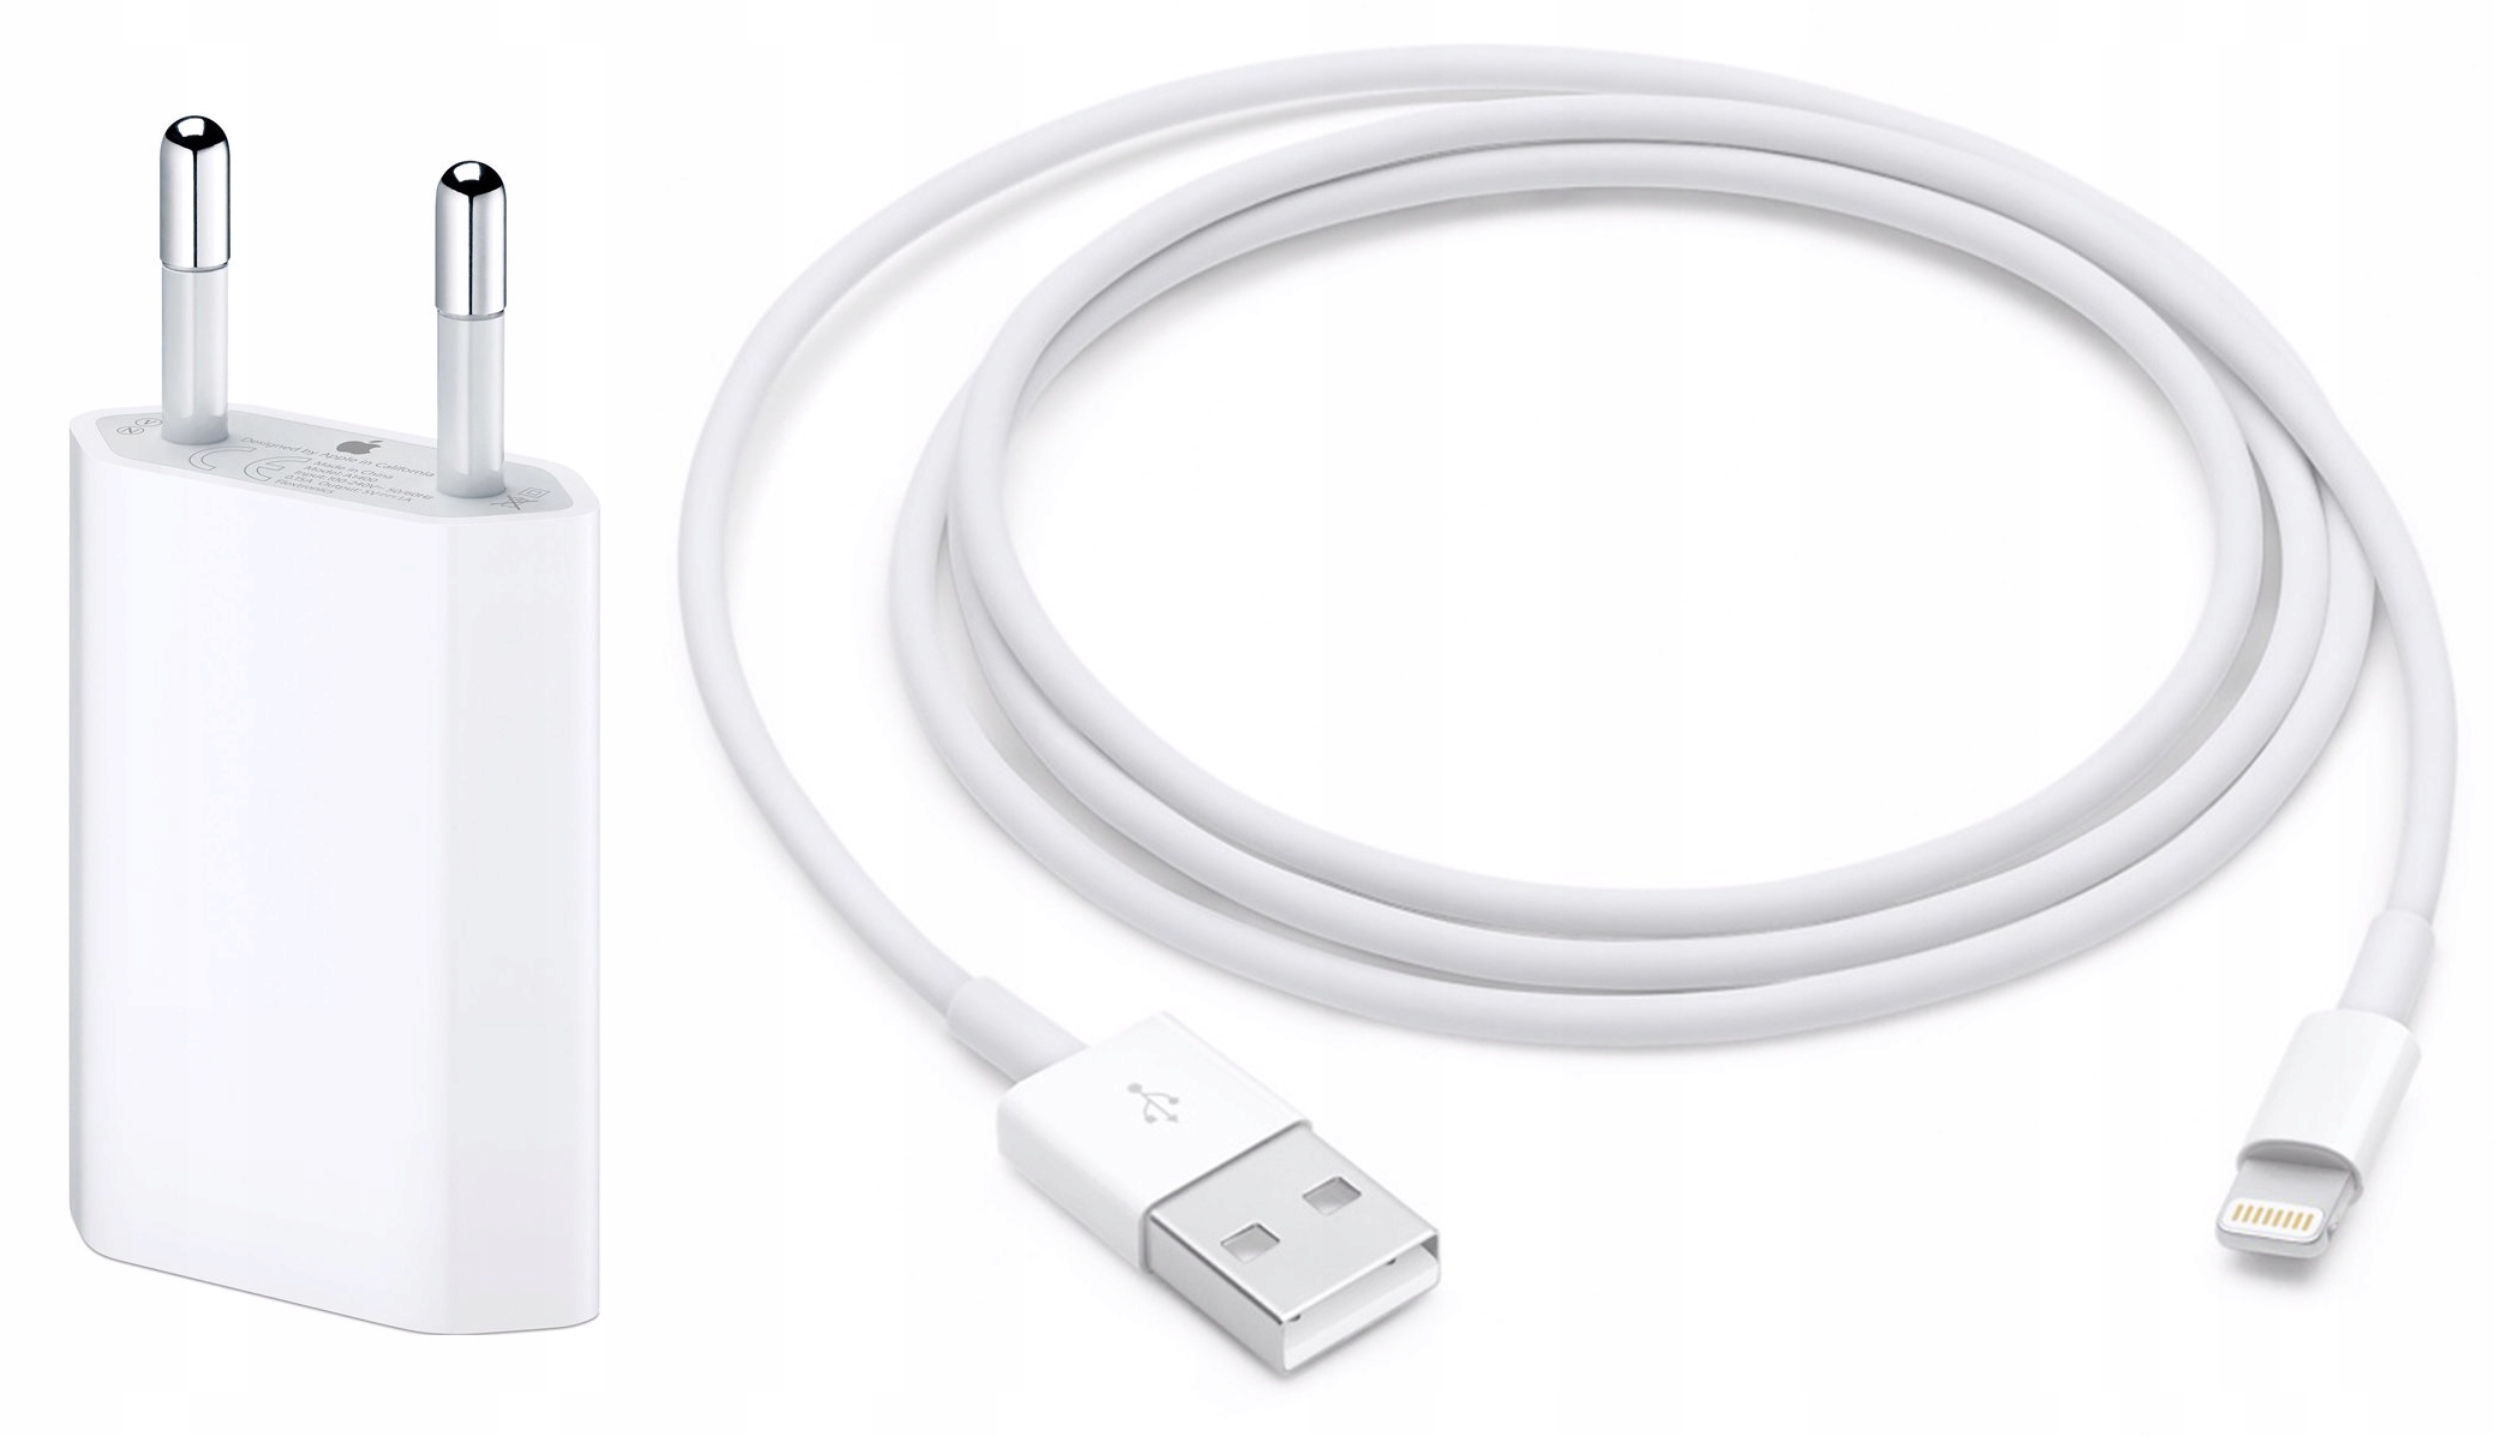 Oryginalny Kabel Ładowarka iPhone 5S 6S 7 8 Plus X